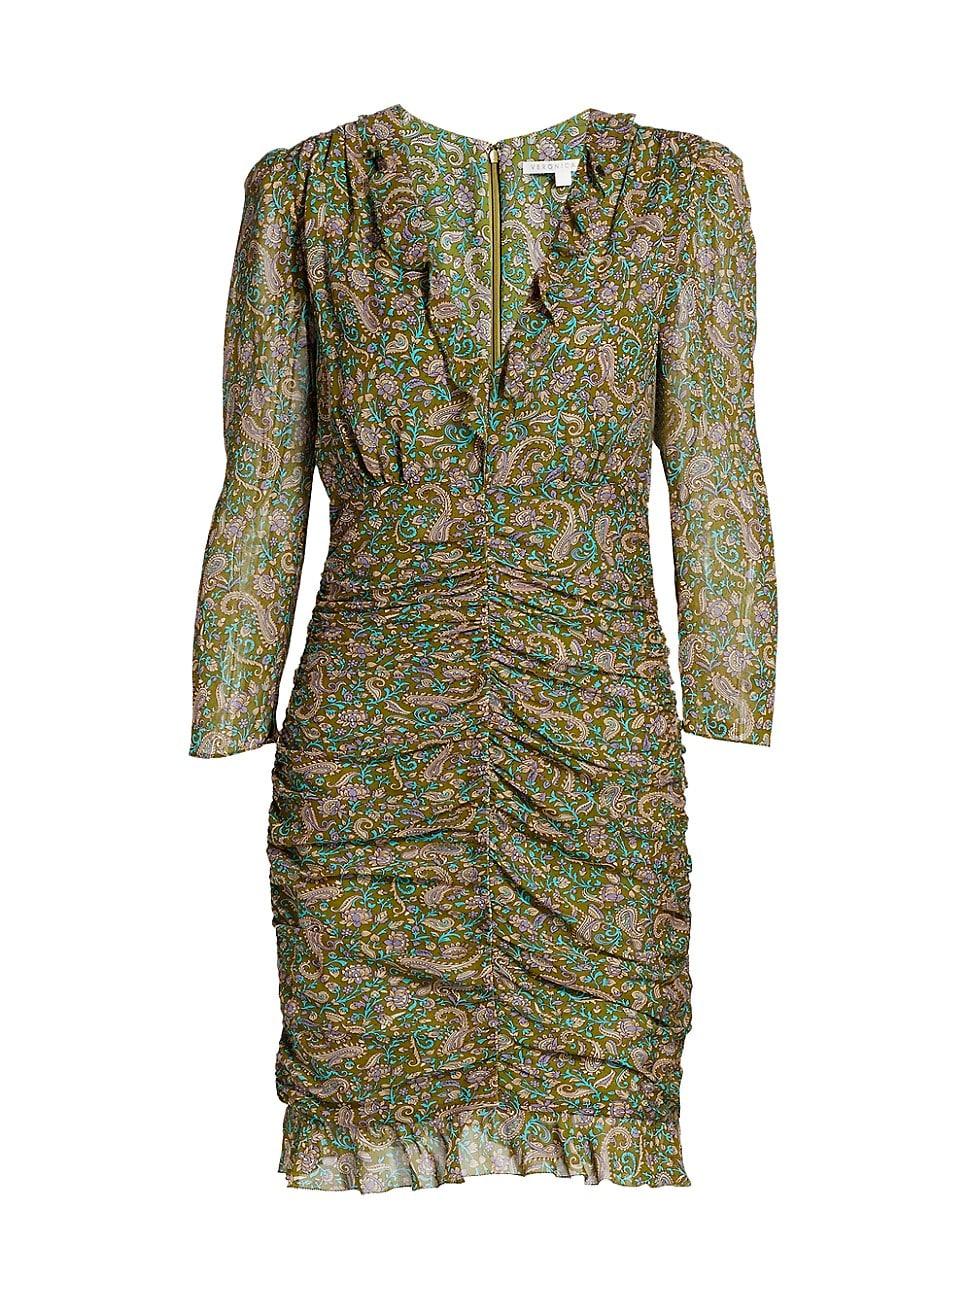 Veronica Beard WOMEN'S SHALA RUCHED SILK DRESS